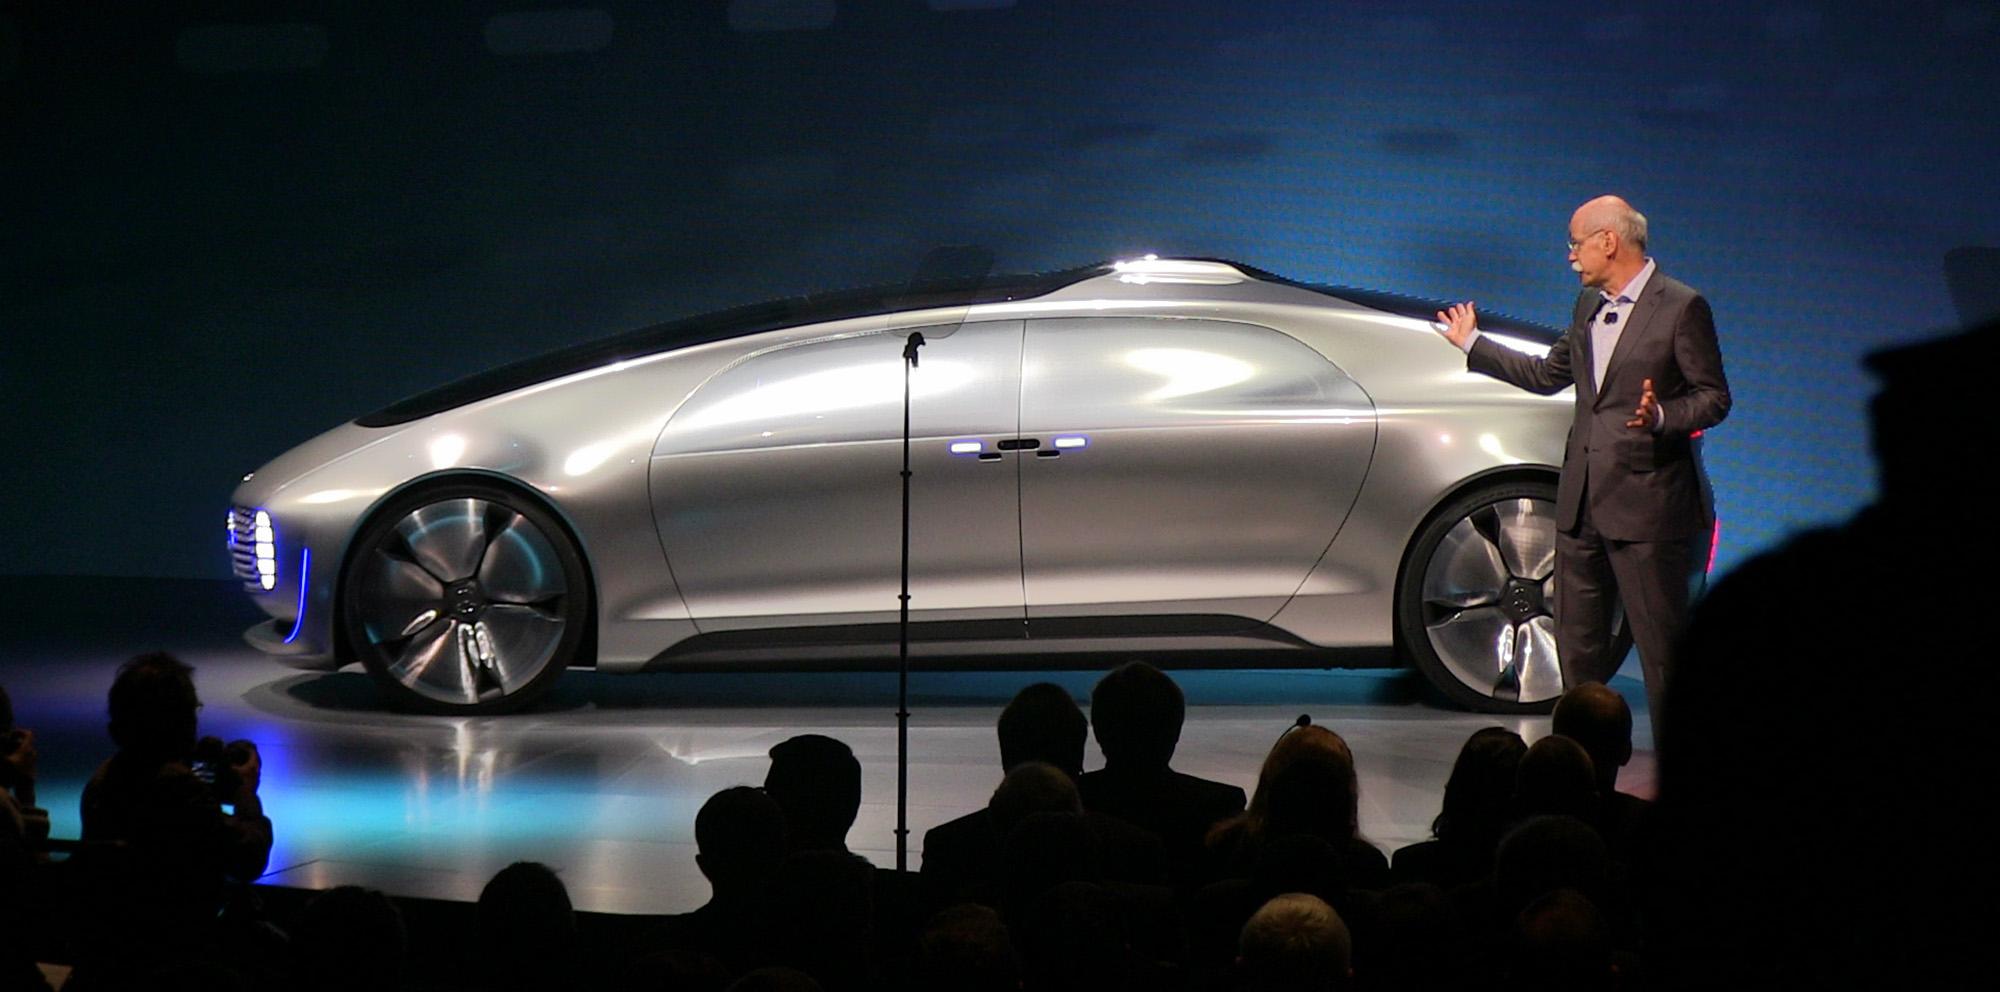 Mercedes F 015 >> Mercedes-Benz F015 Luxury in Motion autonomous concept unveiled at CES - photos | CarAdvice